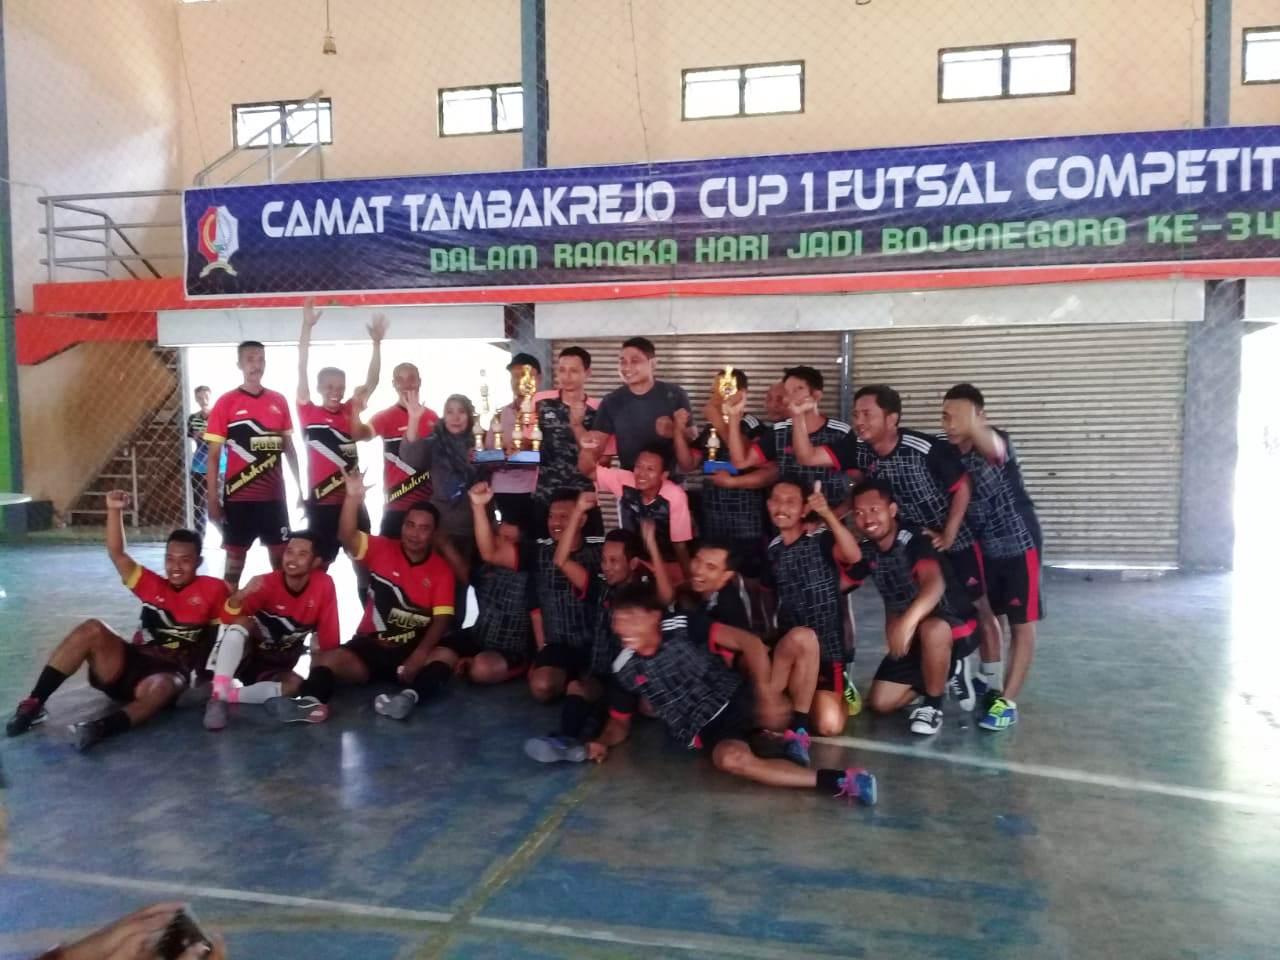 CAMAT TAMBAKREJO CUP I FUTSAL COMPETITIONS 2019<BR>KECAMATAN TAMBAKREJO TAHUN 2019